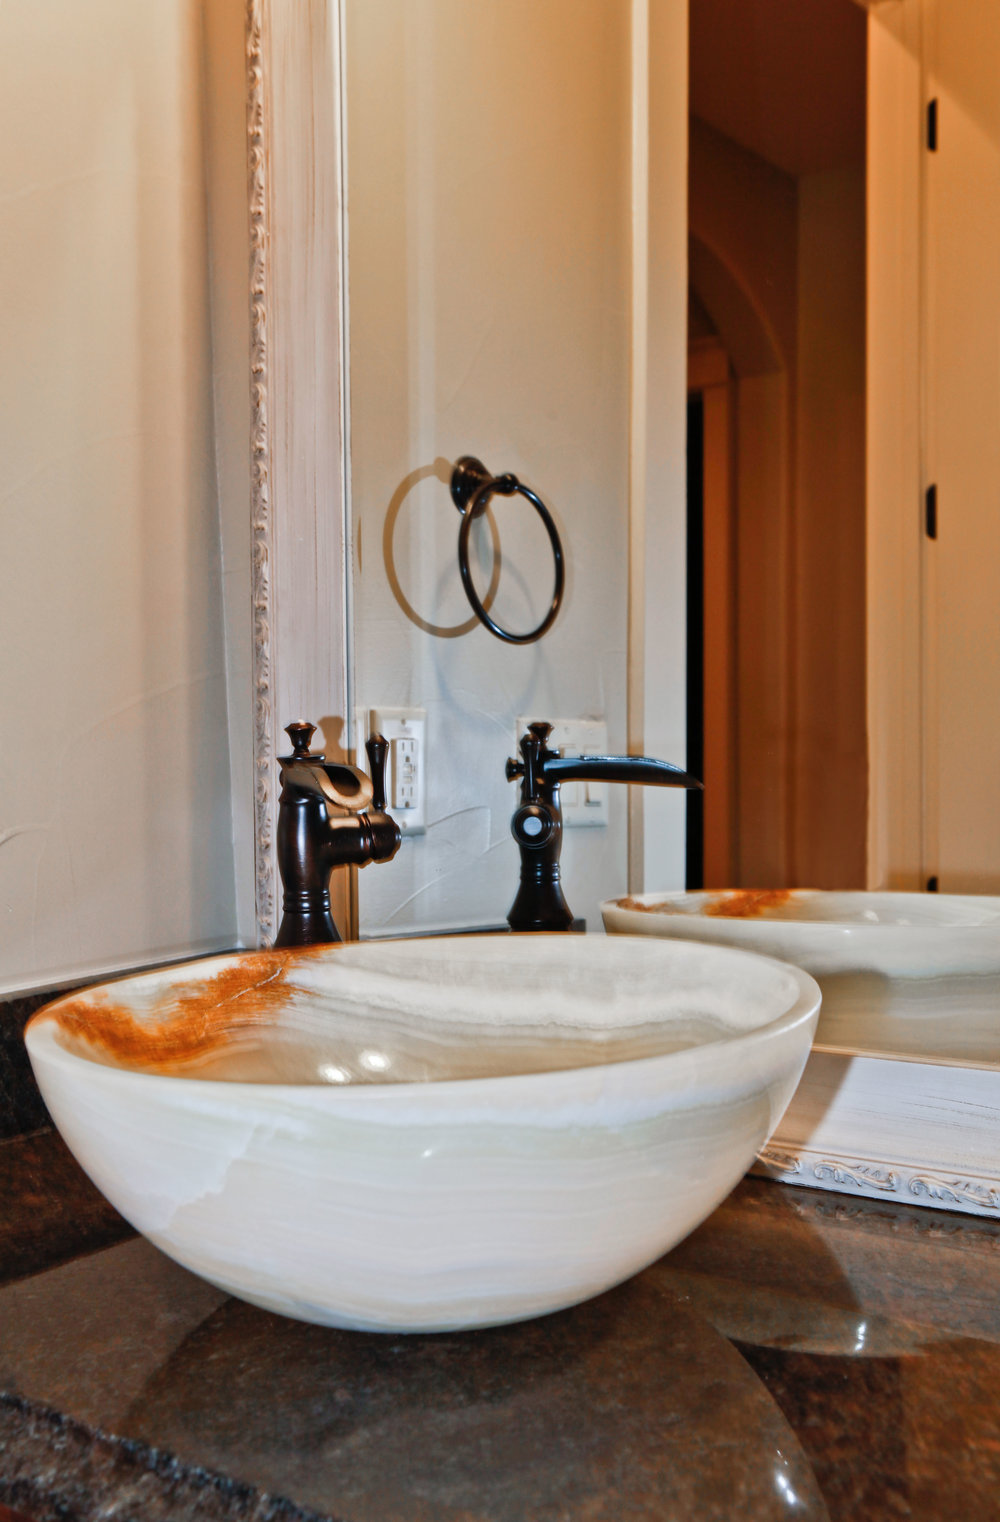 25-guest bath - 1 1.jpg